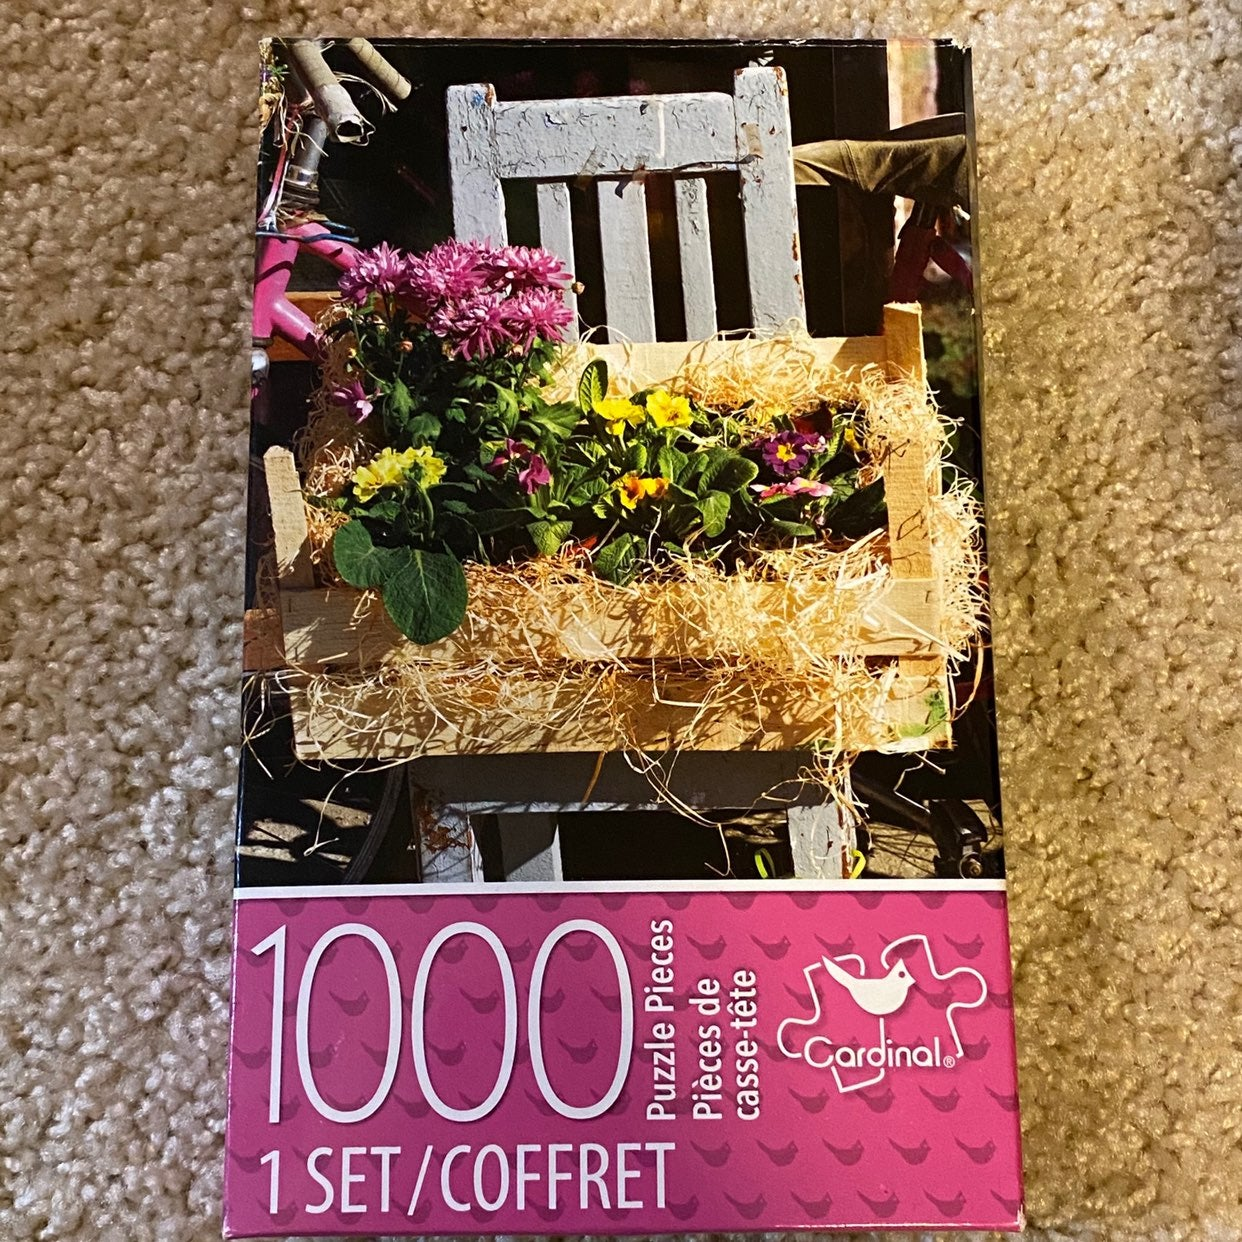 Cardinal Outdoors 1,000 Pc Jigsaw Puzzle